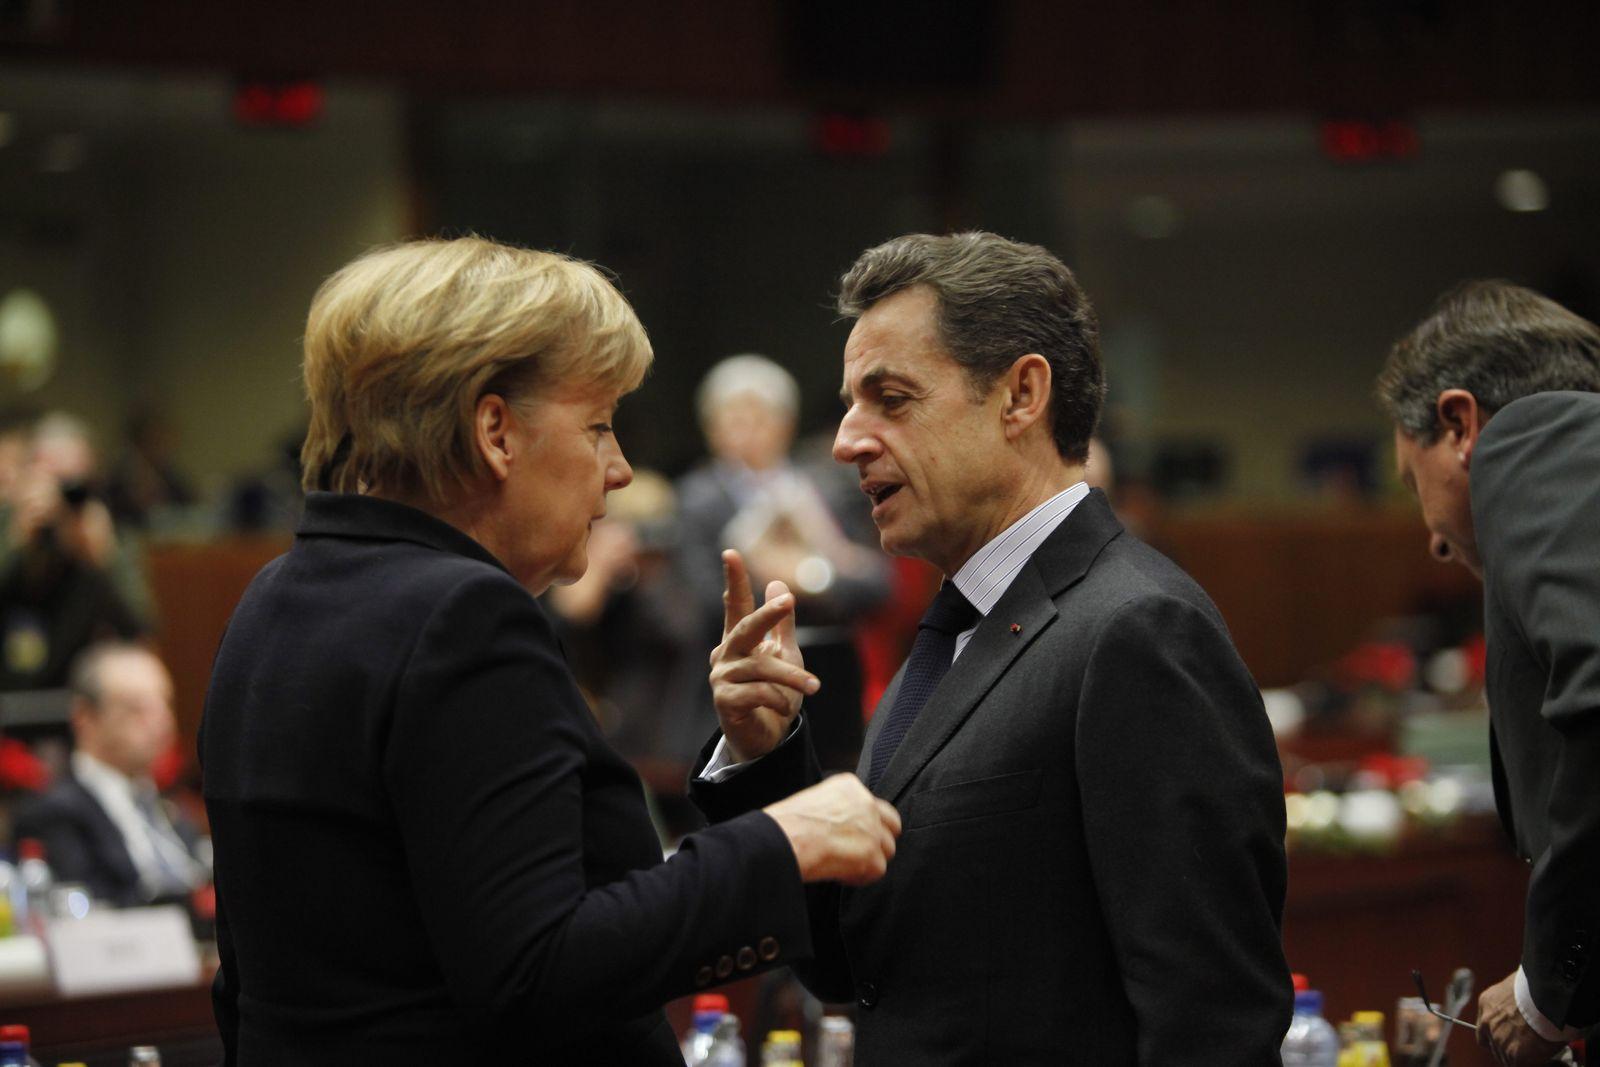 Merkel/ Sarkozy